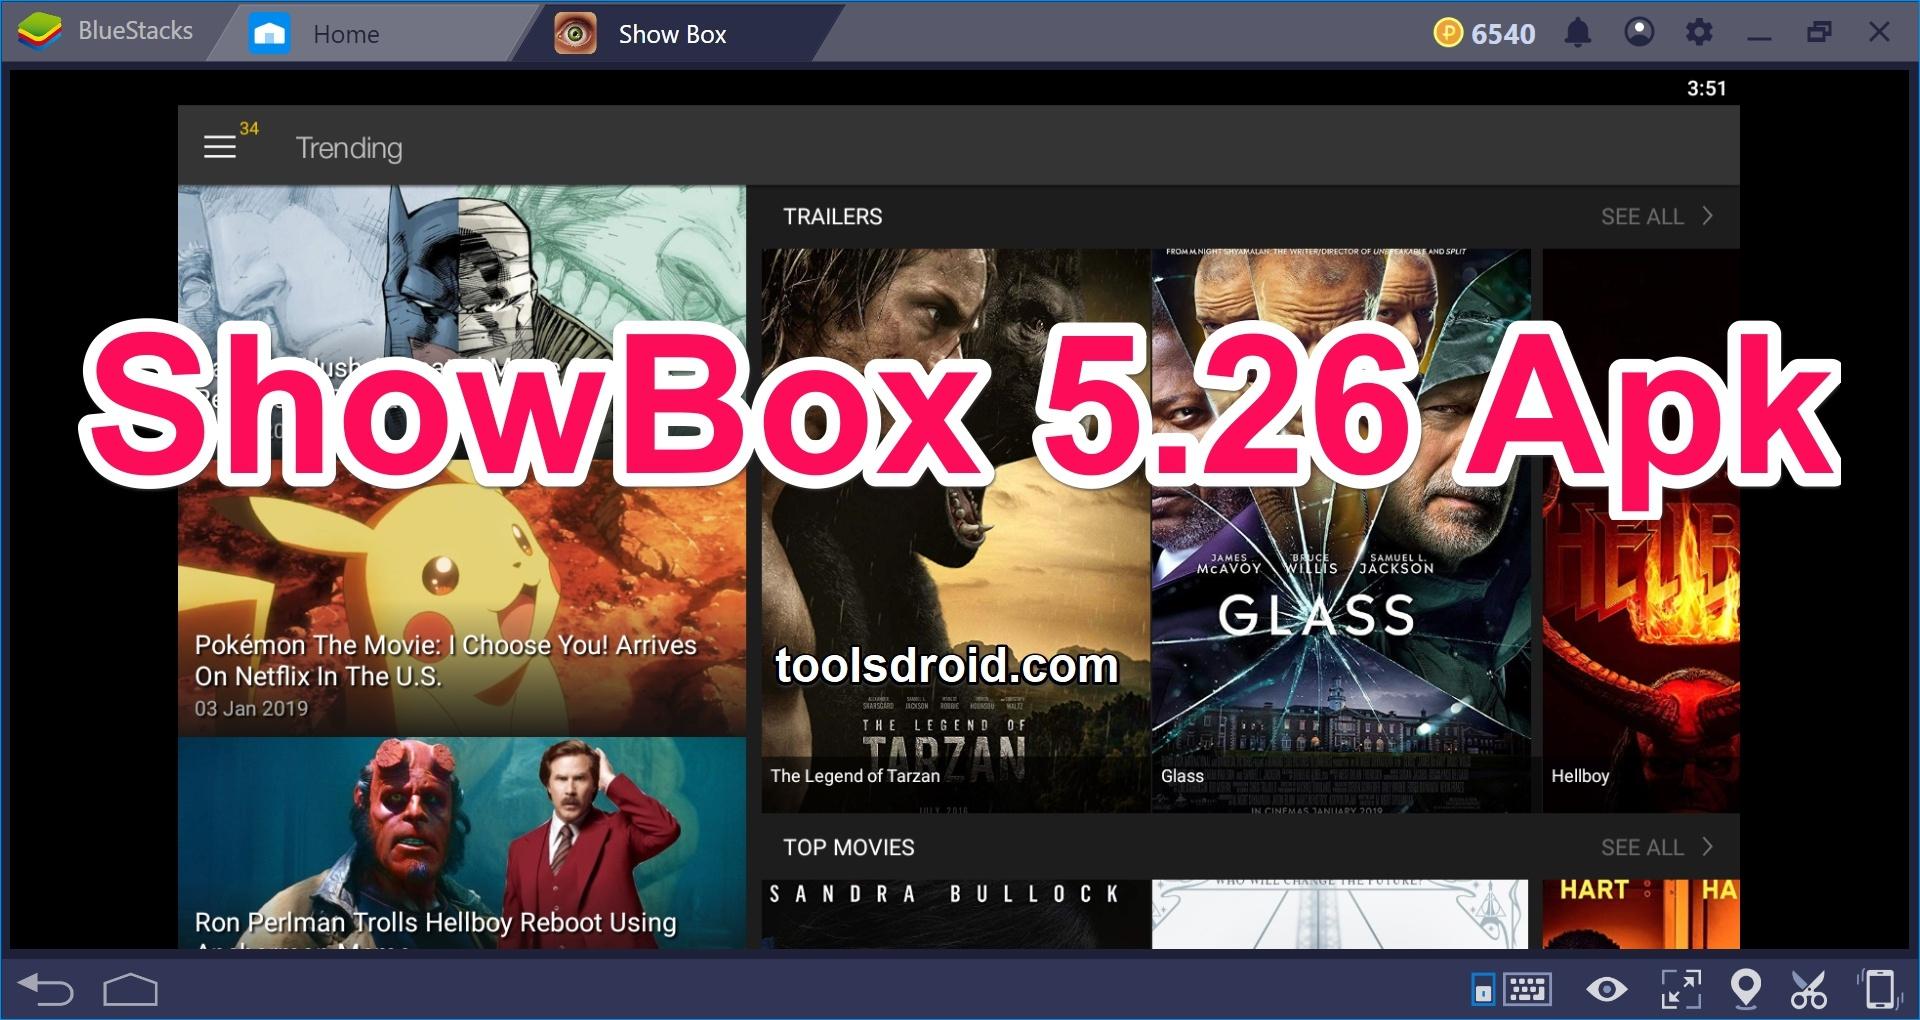 Download ShowBox 5 26 Apk Latest version [03 January 2019] - ToolsDroid